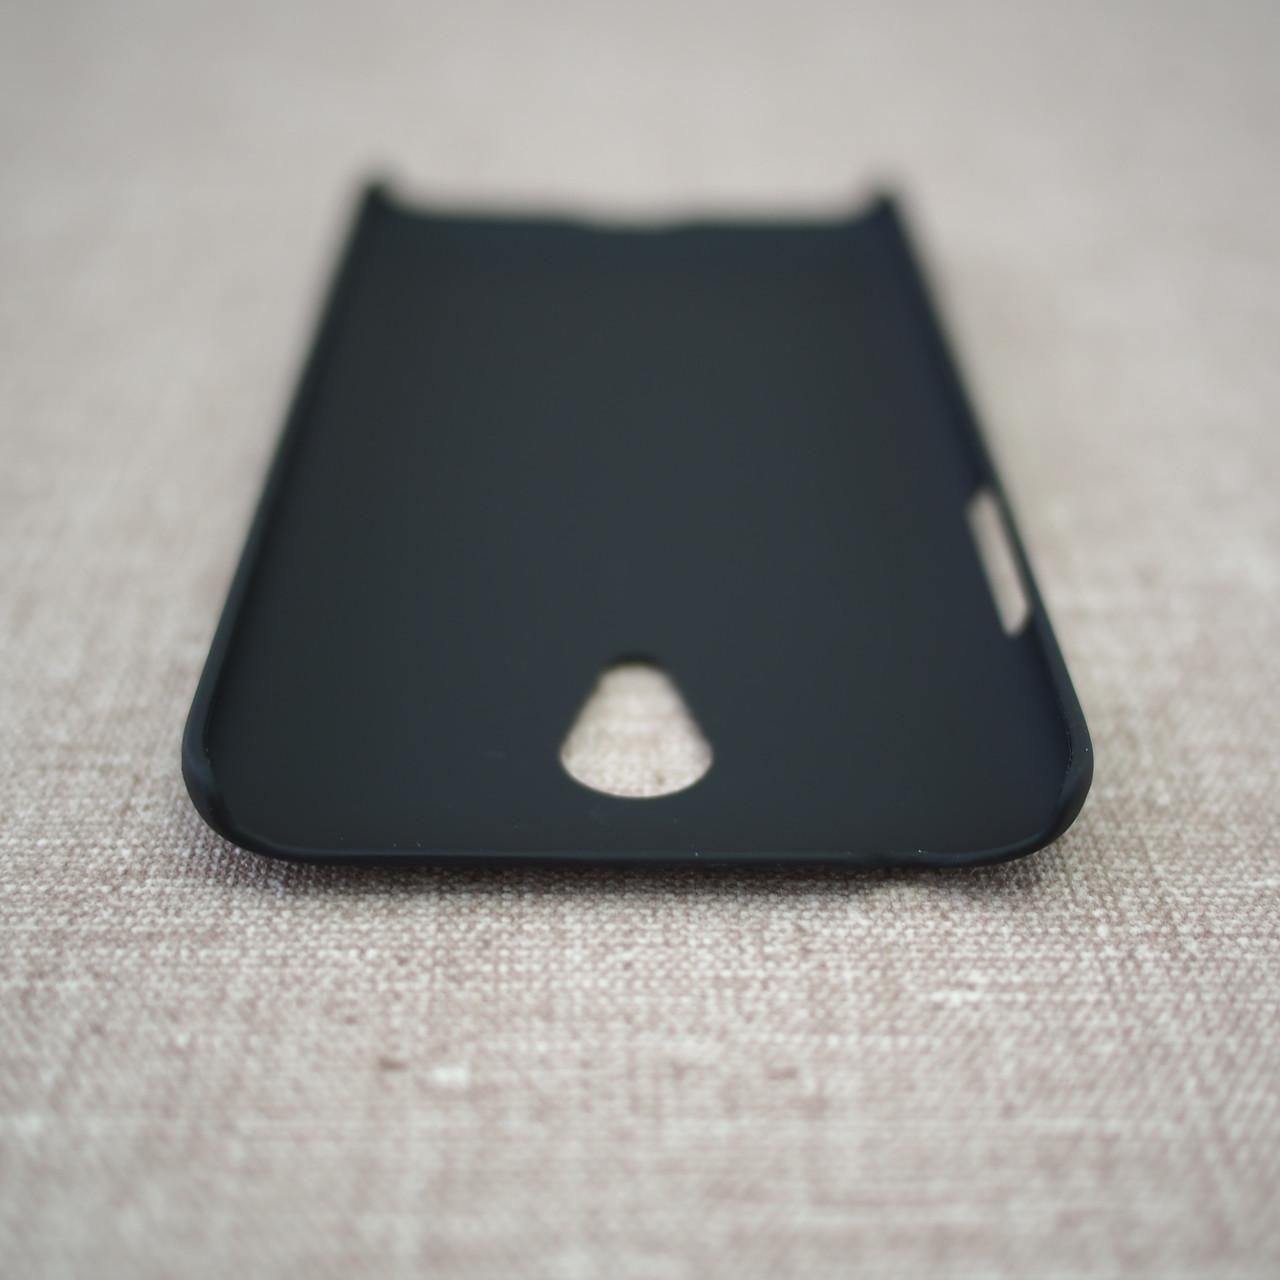 Nillkin Super Frosted Shield Meizu M1 Note black